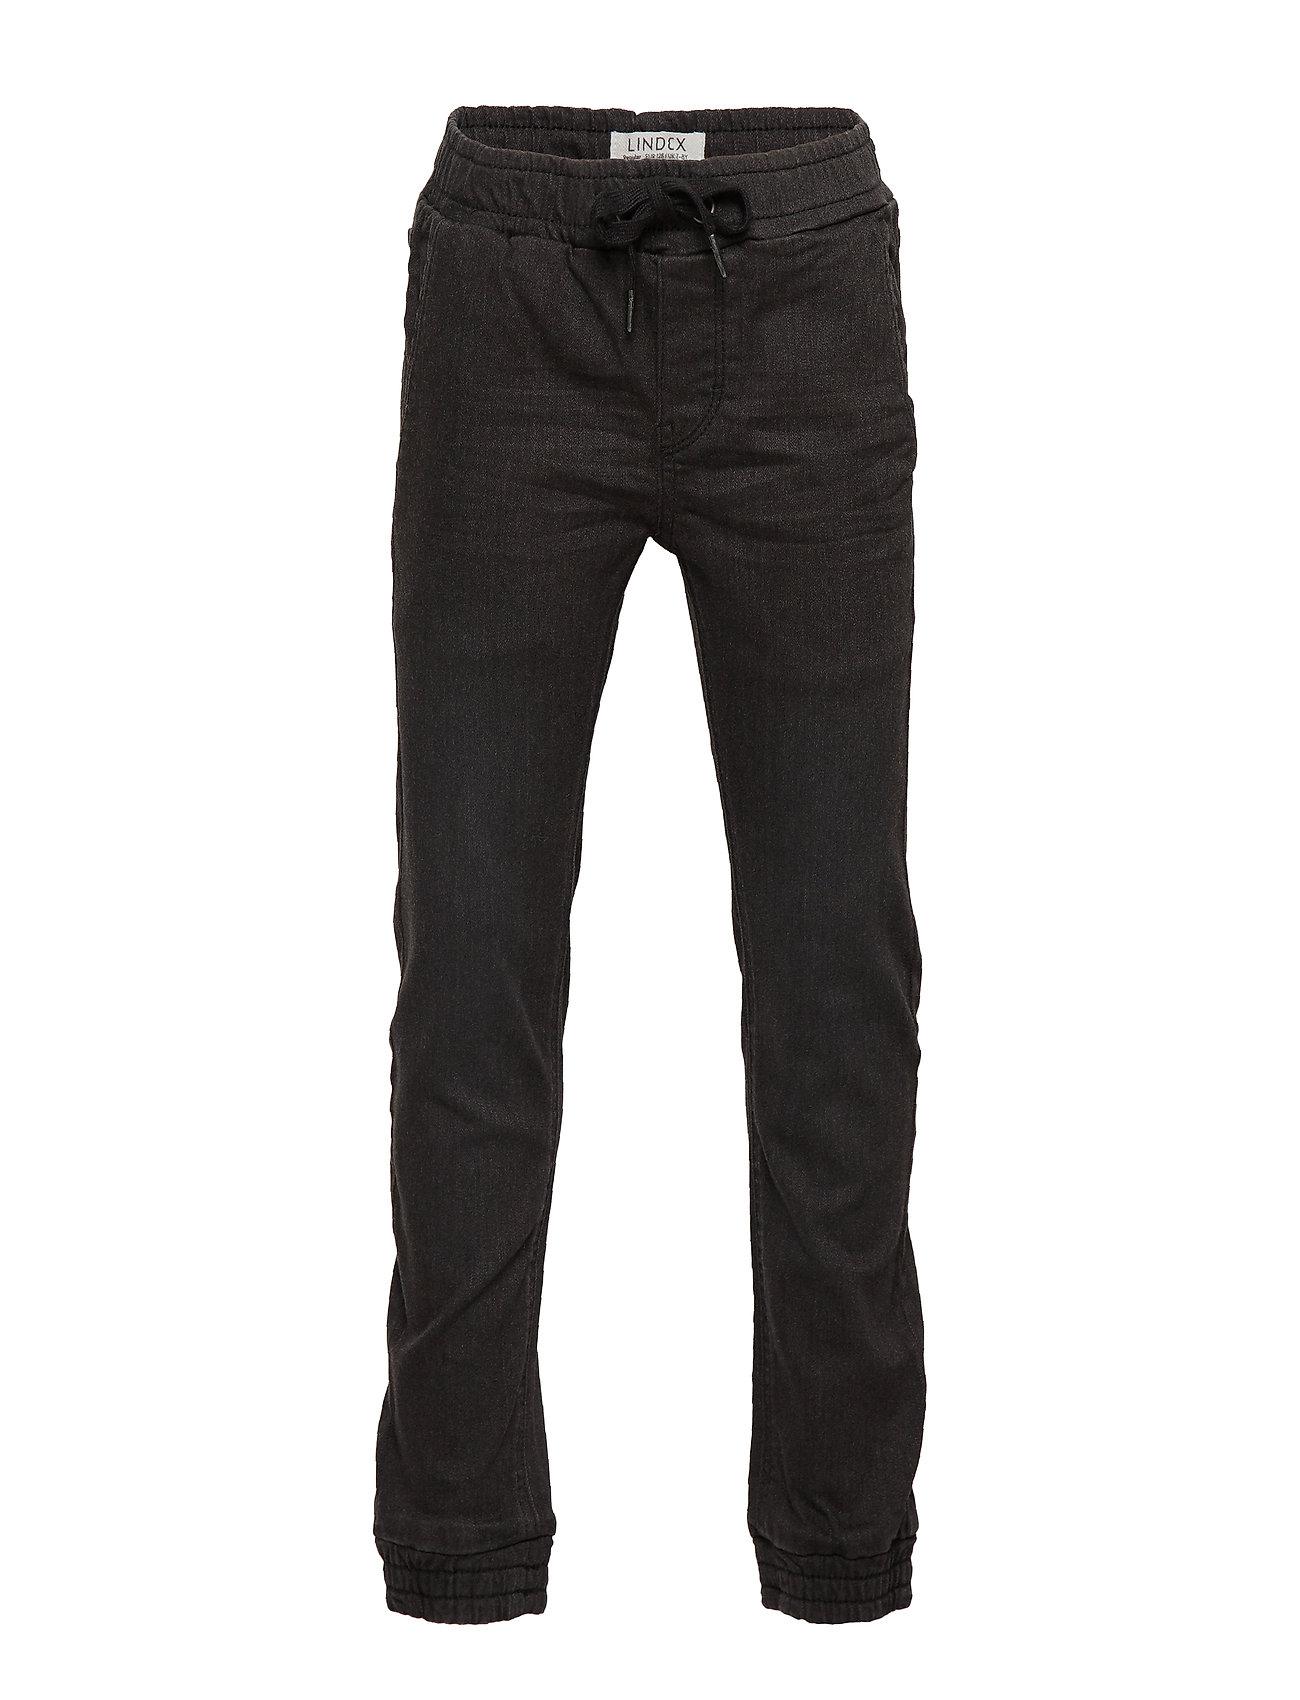 Lindex Trousers Reg jogger cordura bl - BLACK